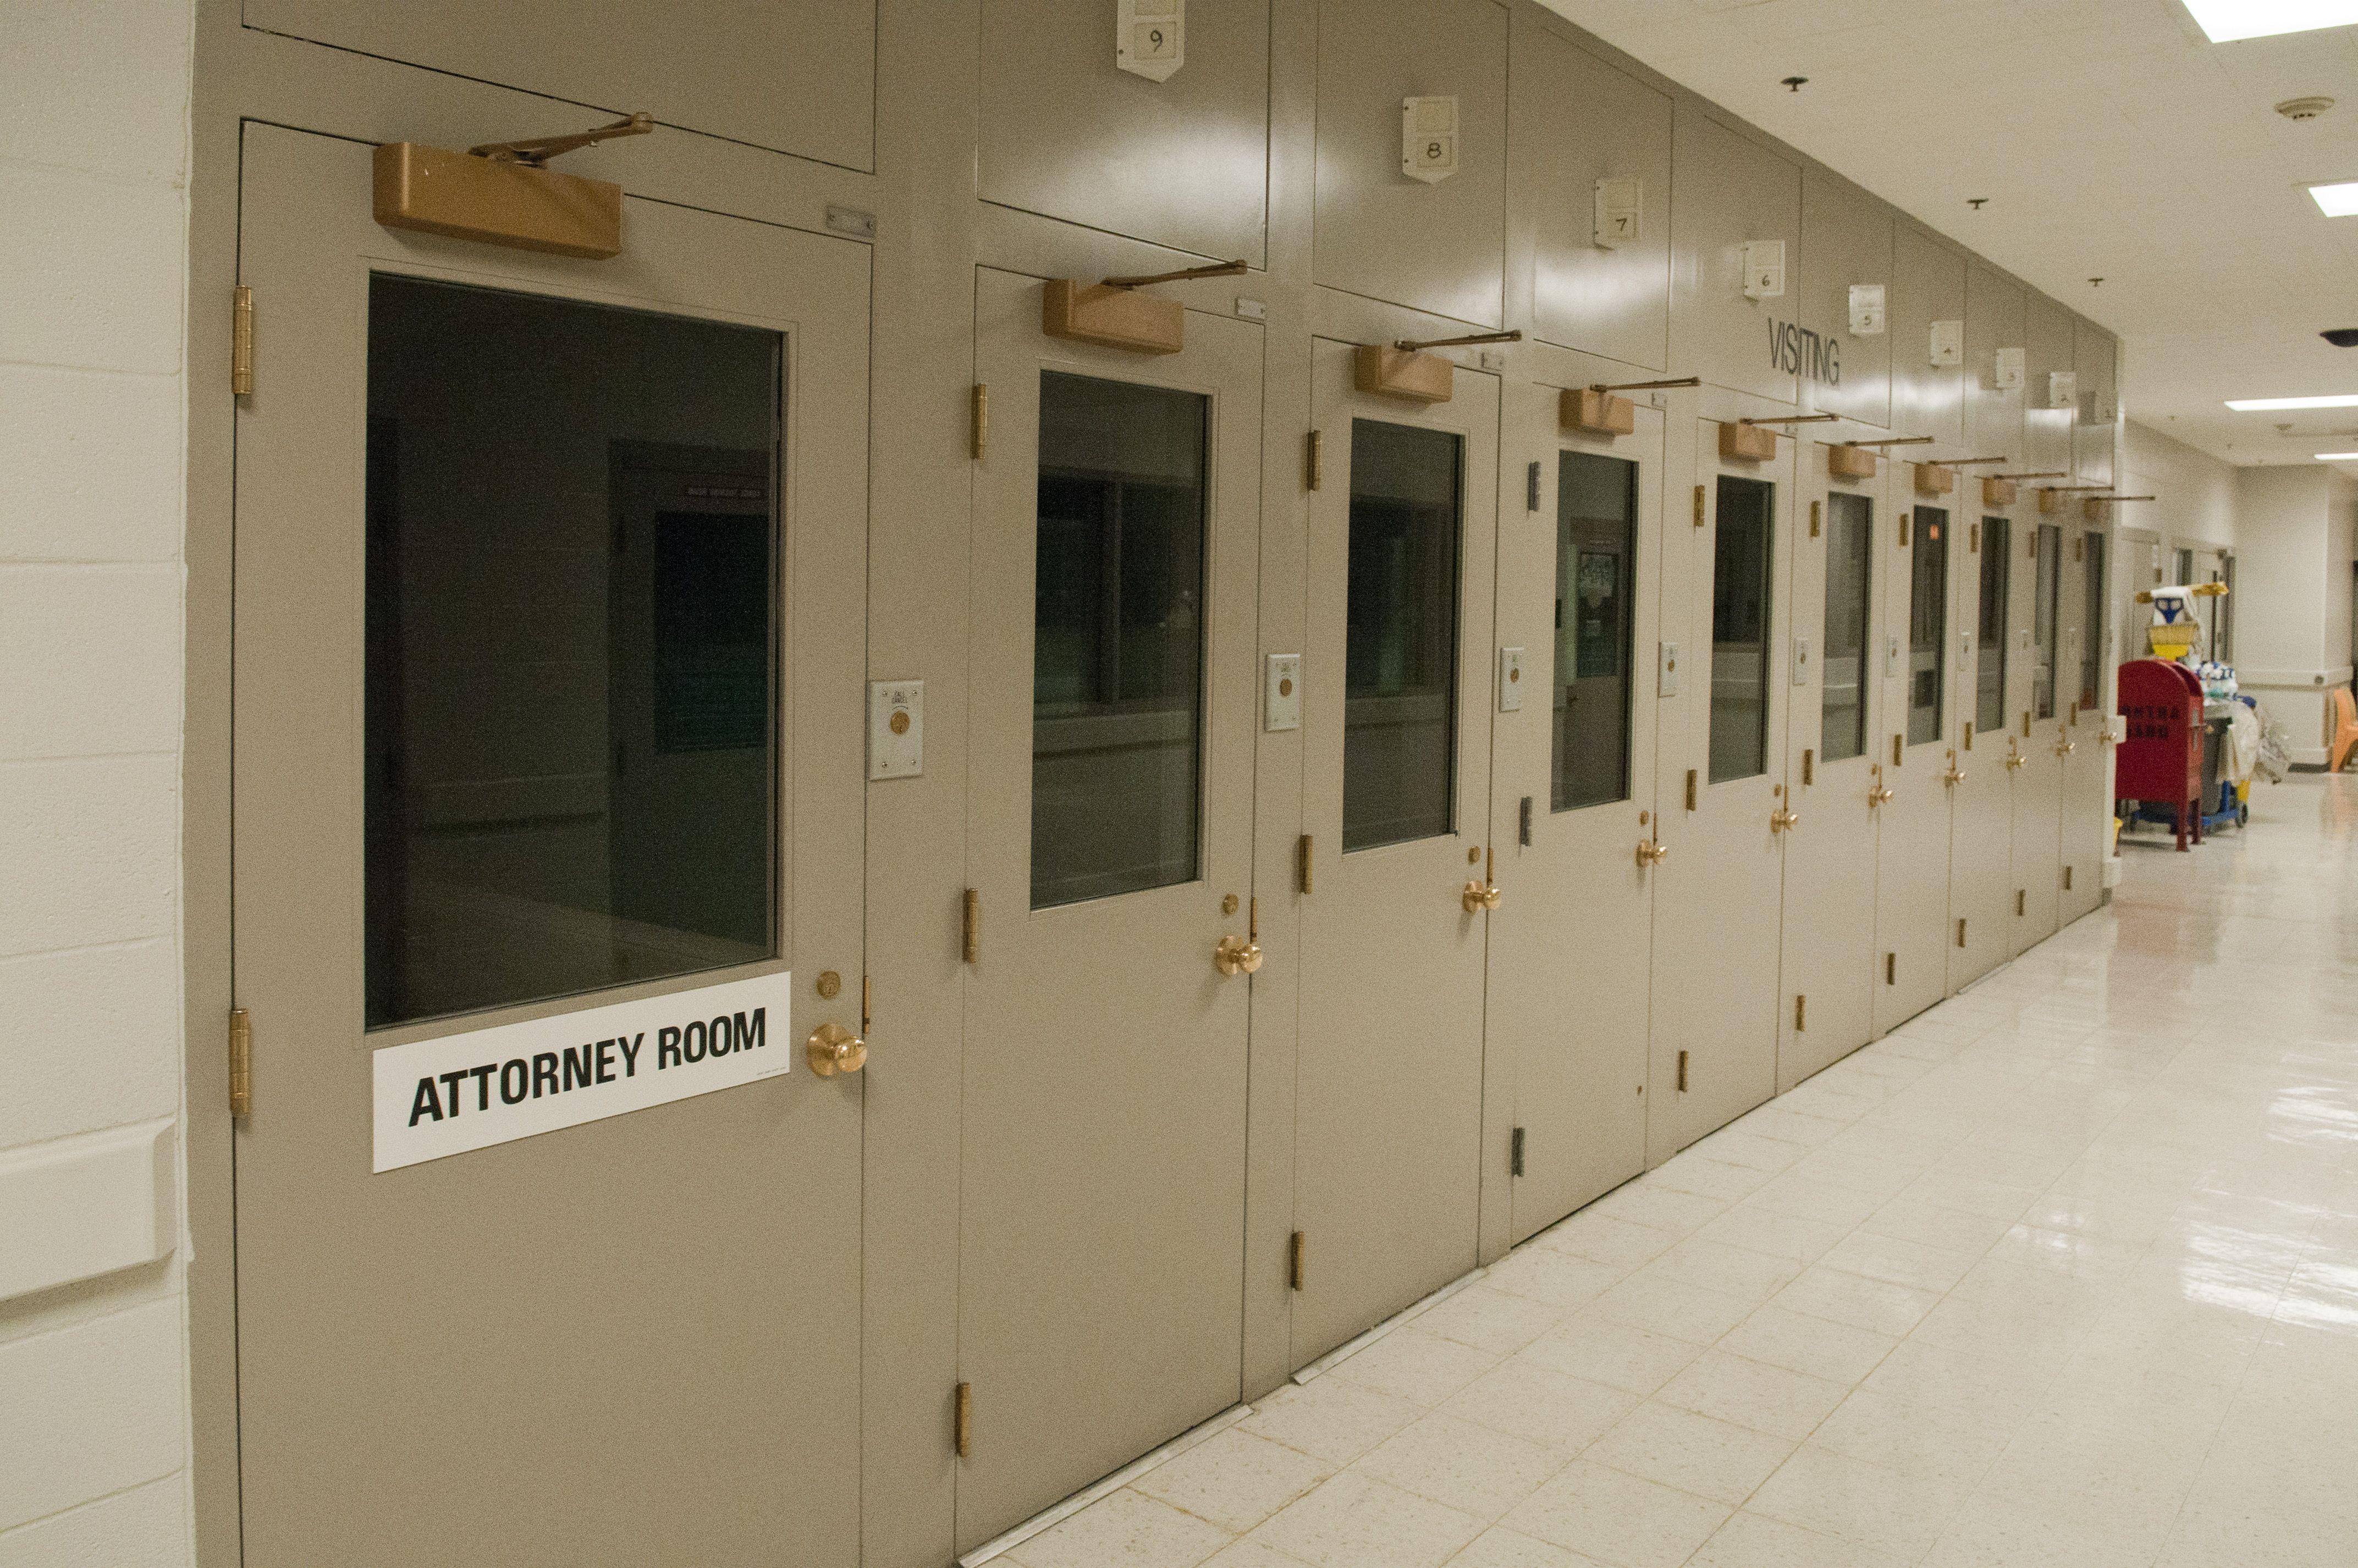 Pin On La County Jails